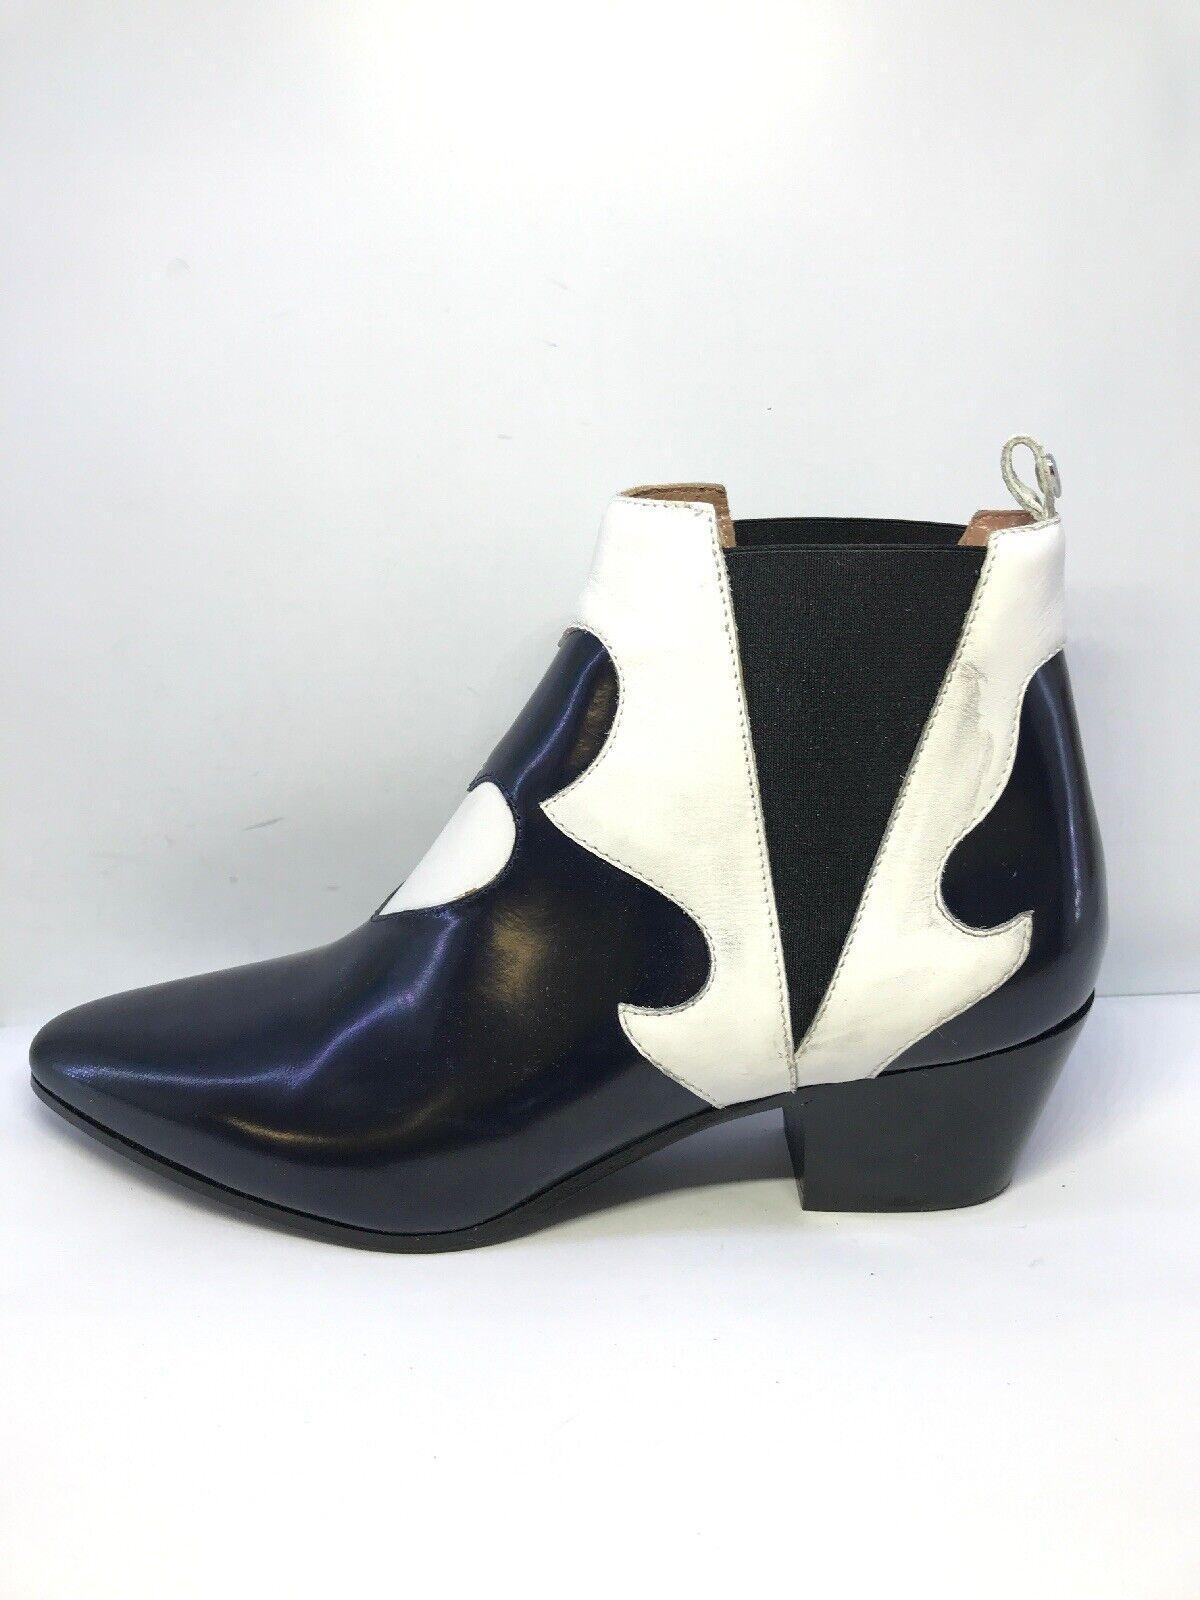 5cc2edef66ccb Twin Set Simona Barbieri Pointed Heeled Heeled Heeled Ankle Boots ...